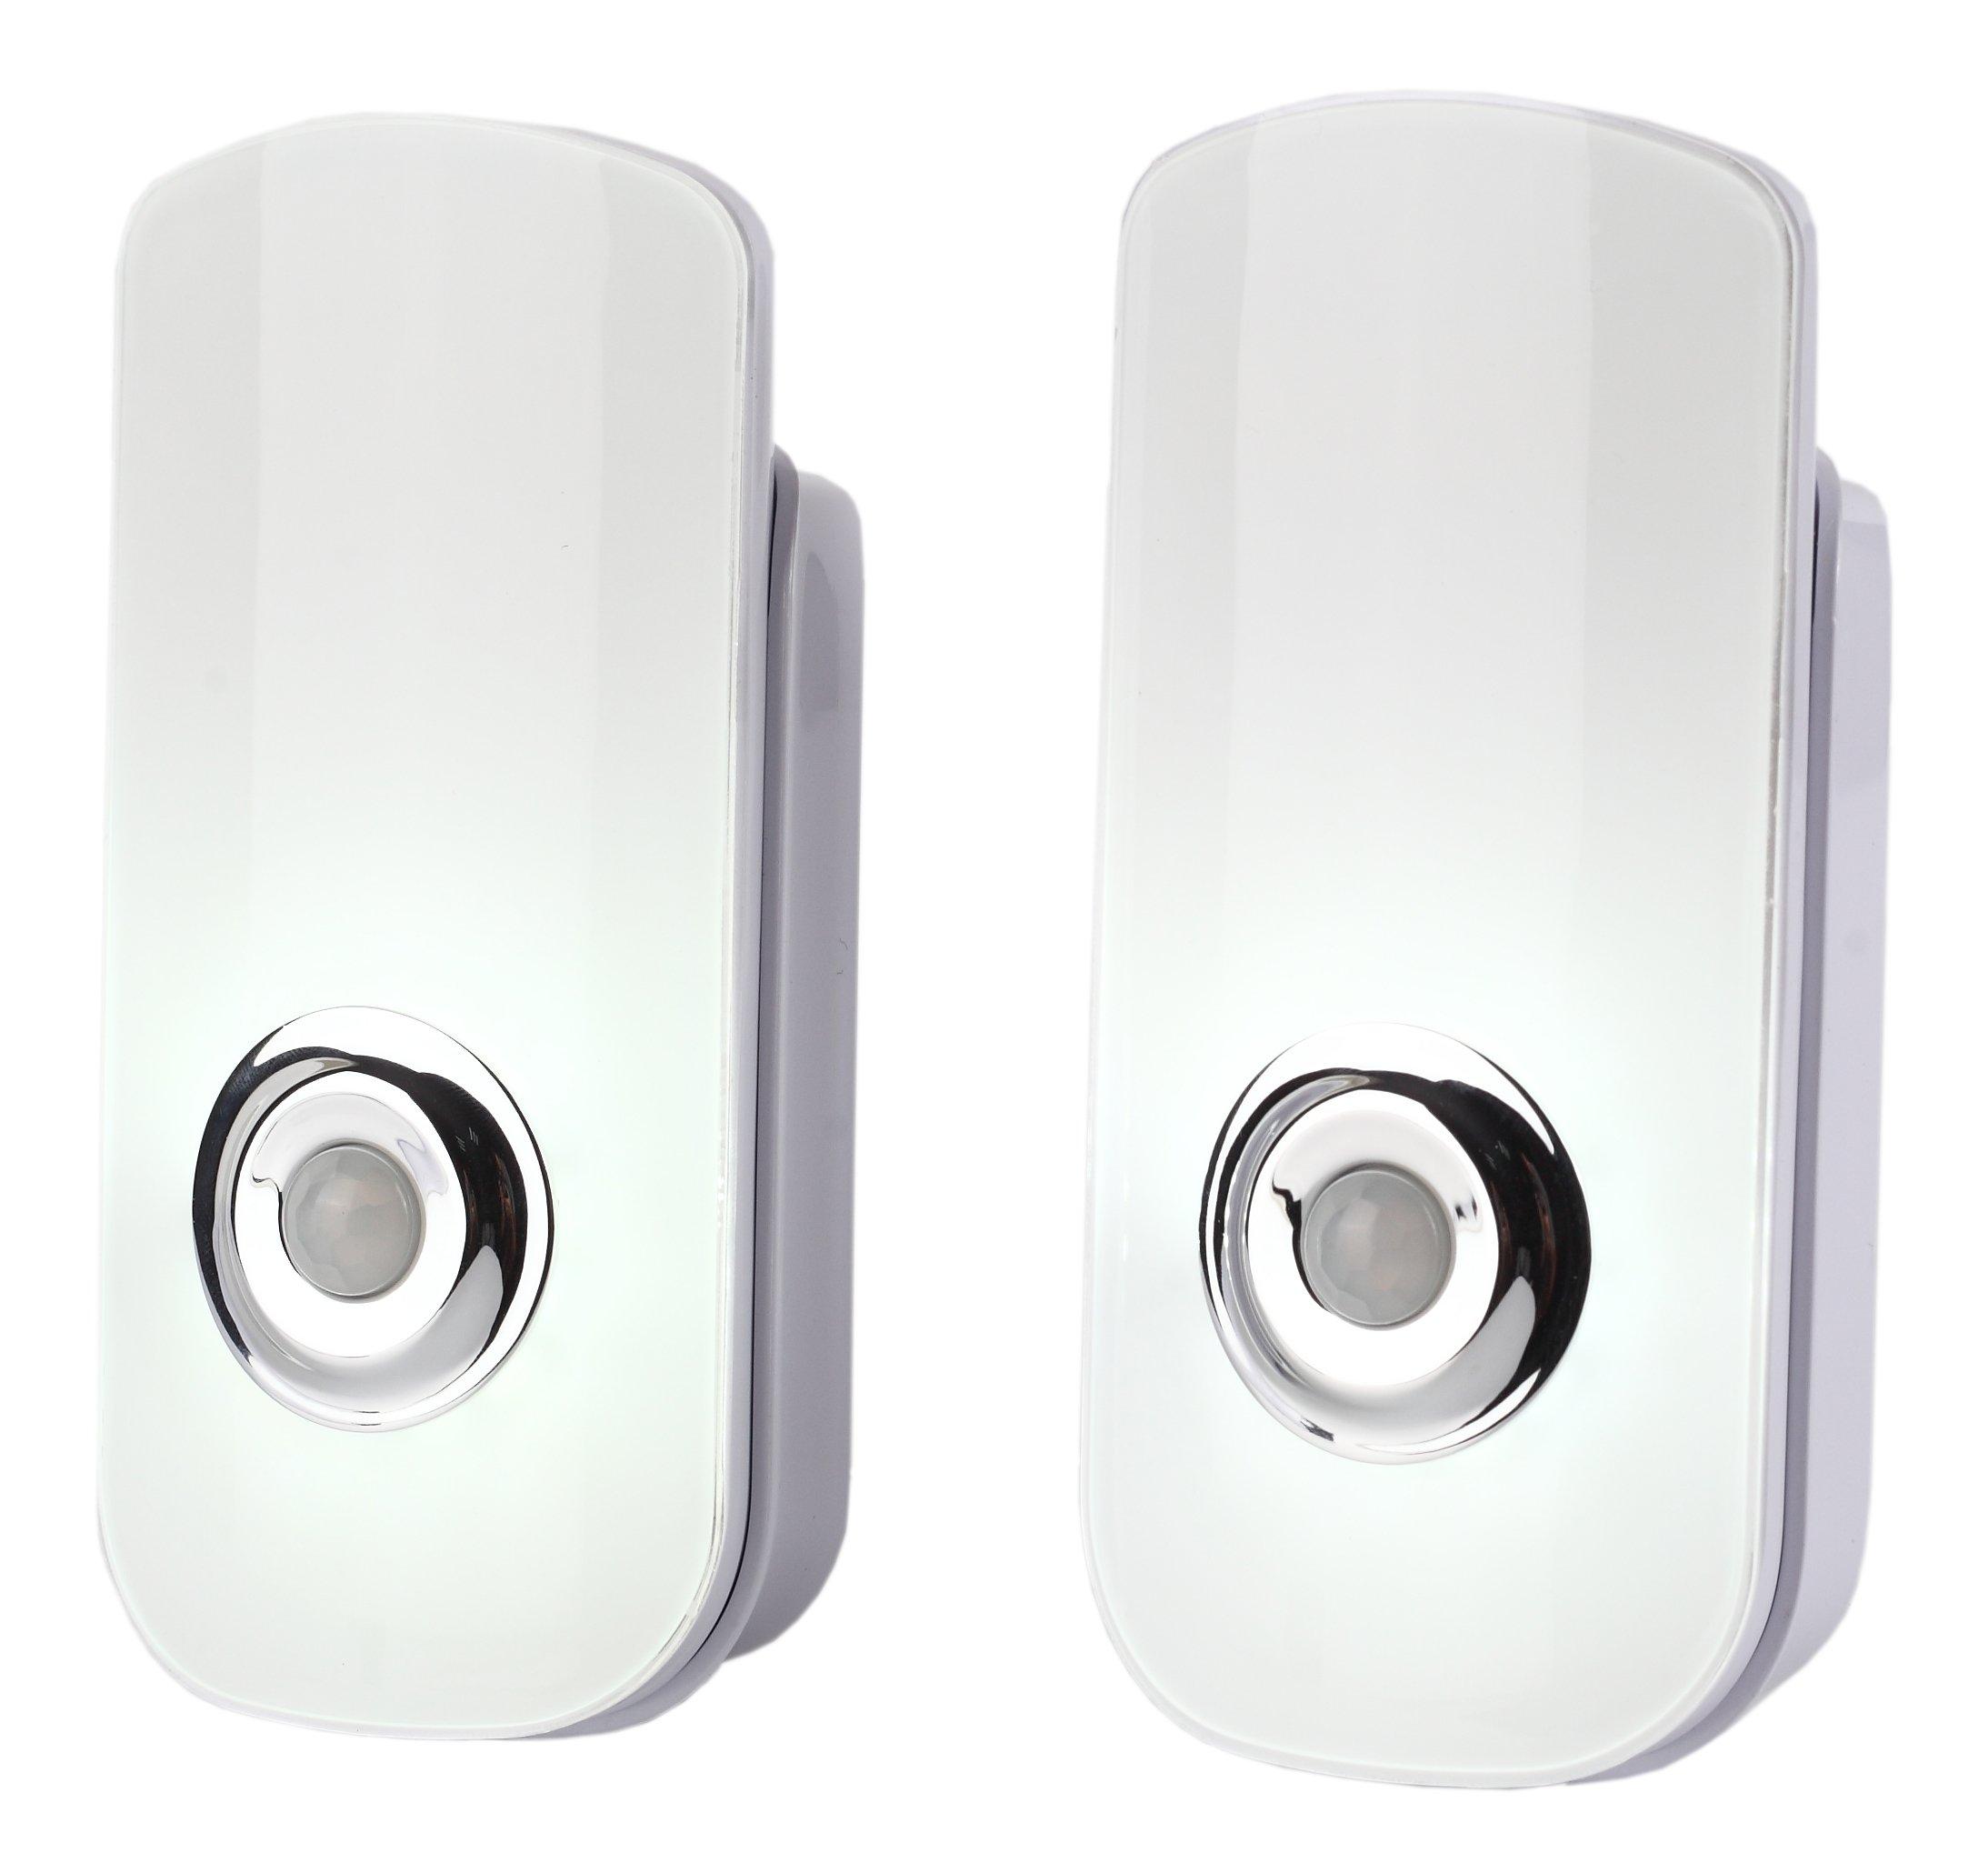 BONASHI LED Motion Sensor Night Light, Rechargeable Emergency Power Failure light, Portable Flashlight Torch Light (2-Pack with White light)